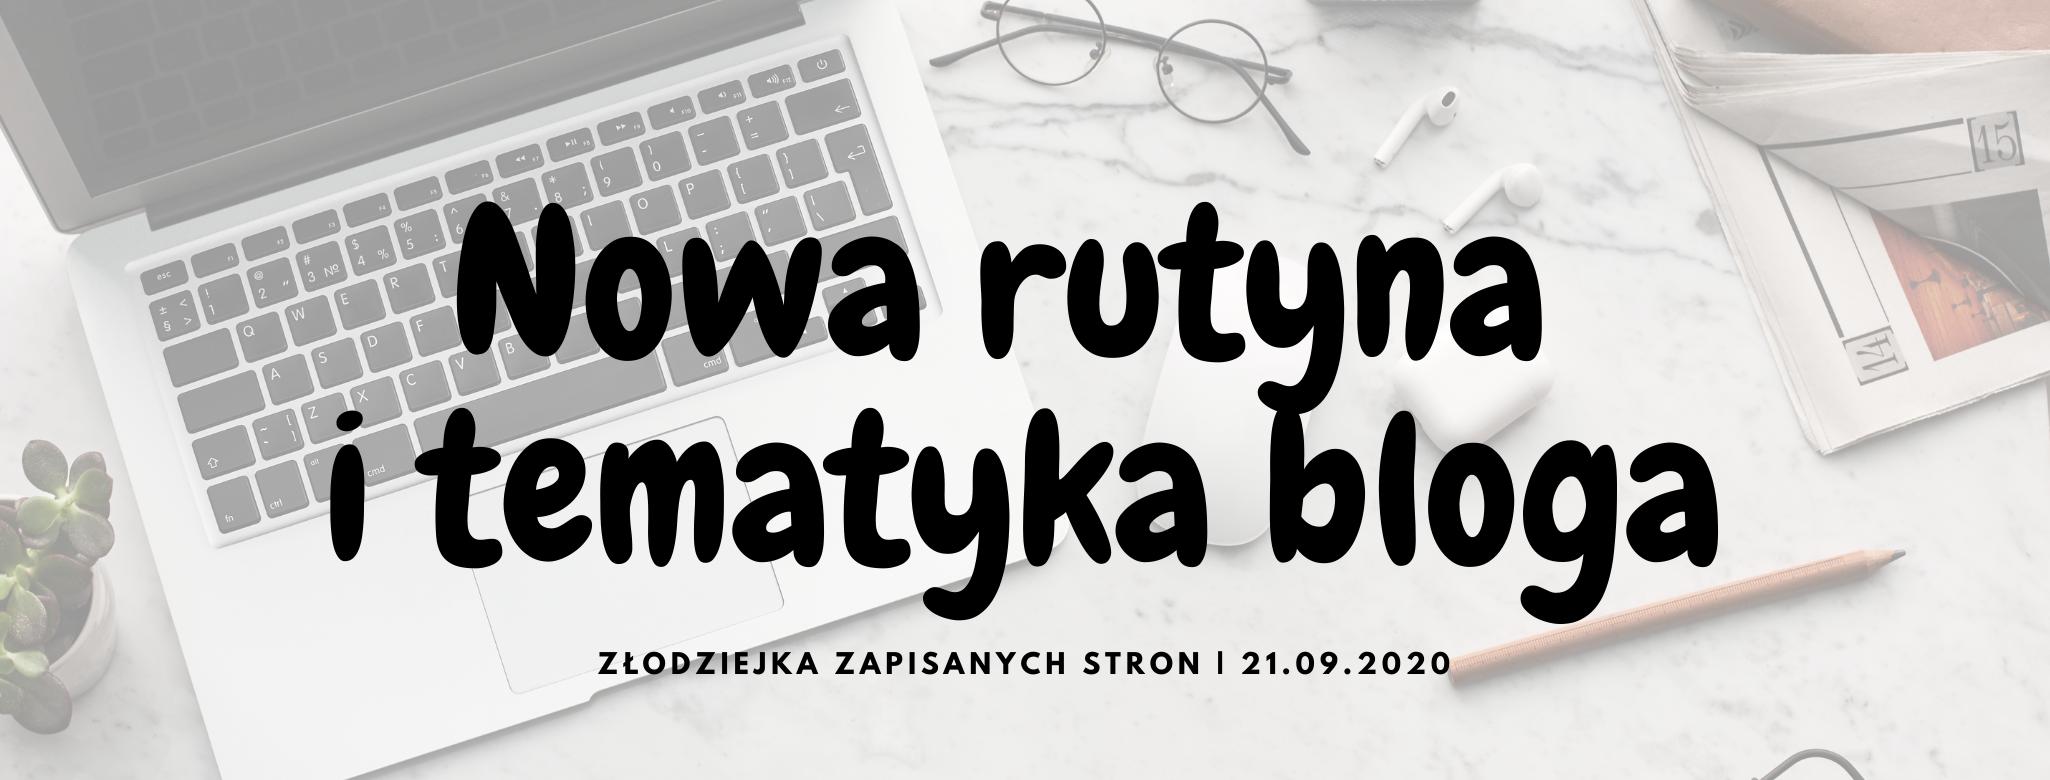 Nowa rutyna oraz tematyka bloga